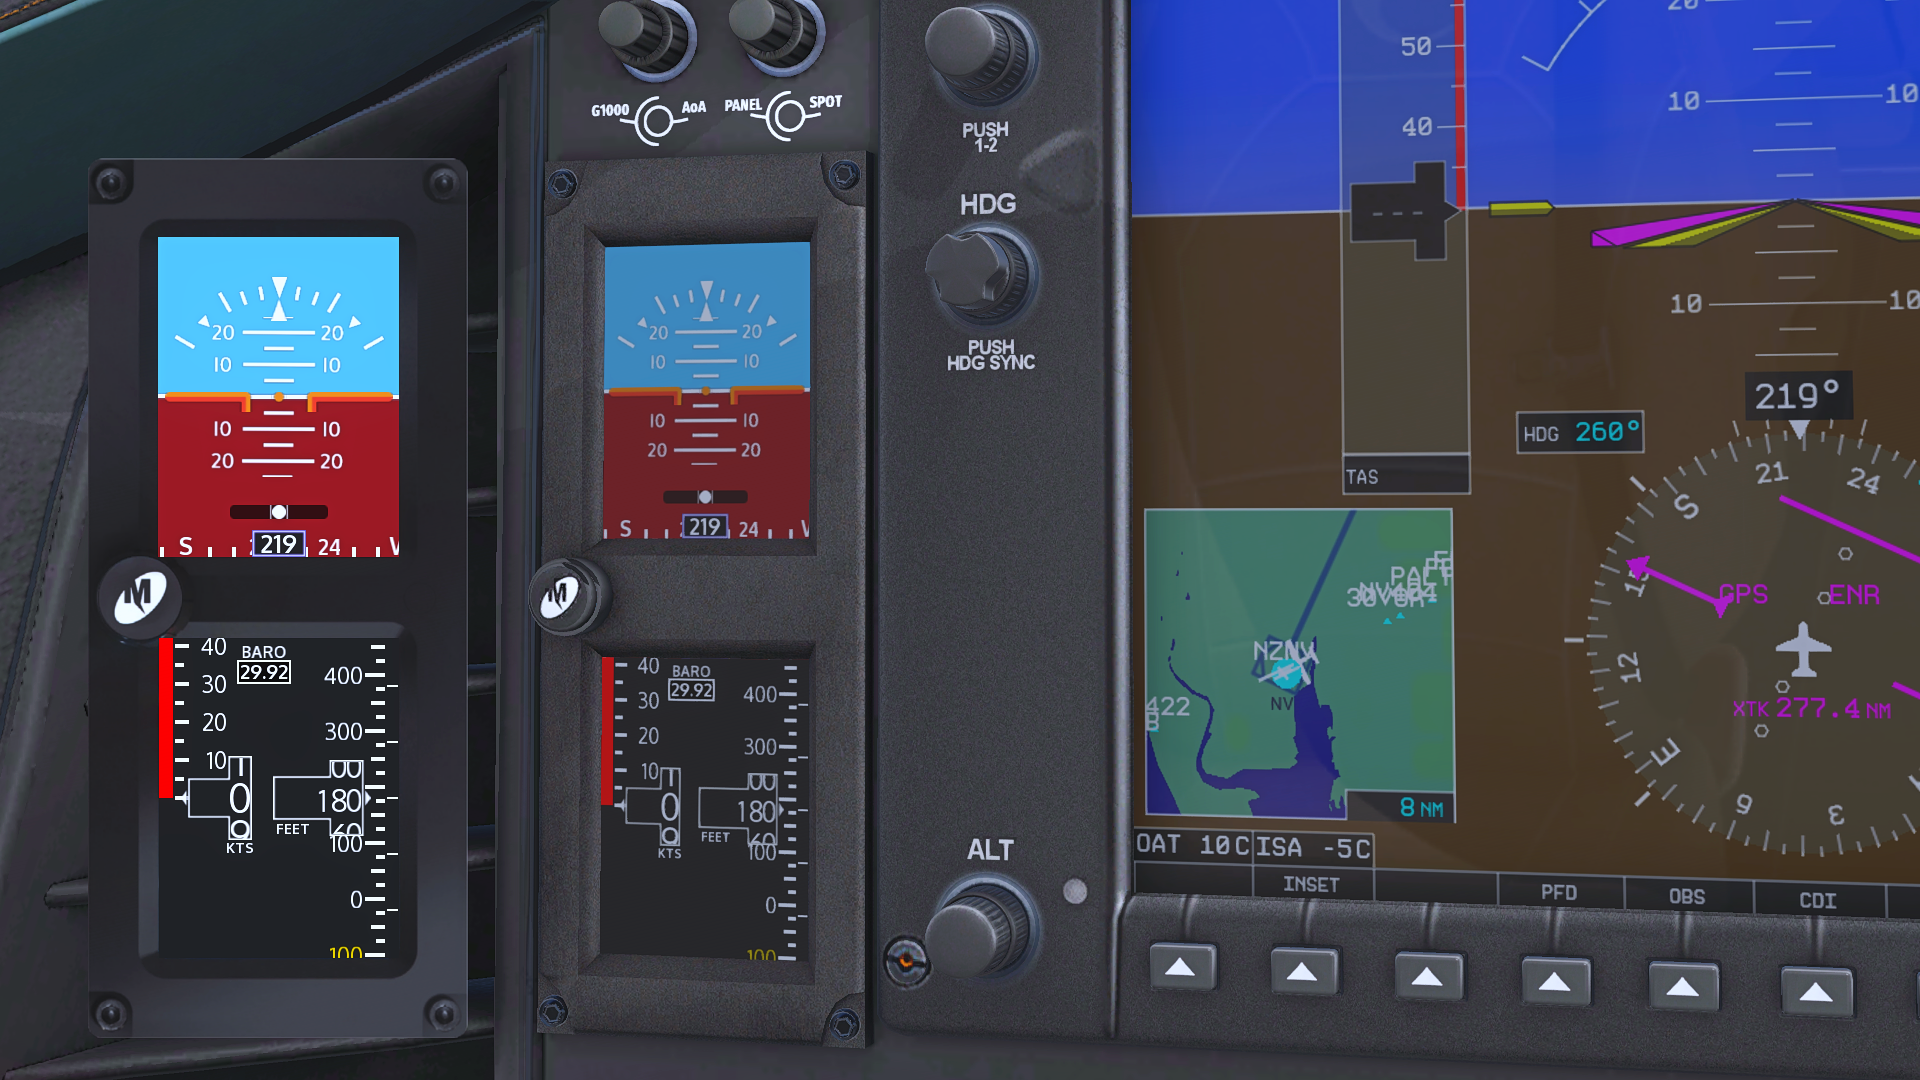 Threshold Review: Aerobask E1000 G1000 Edition